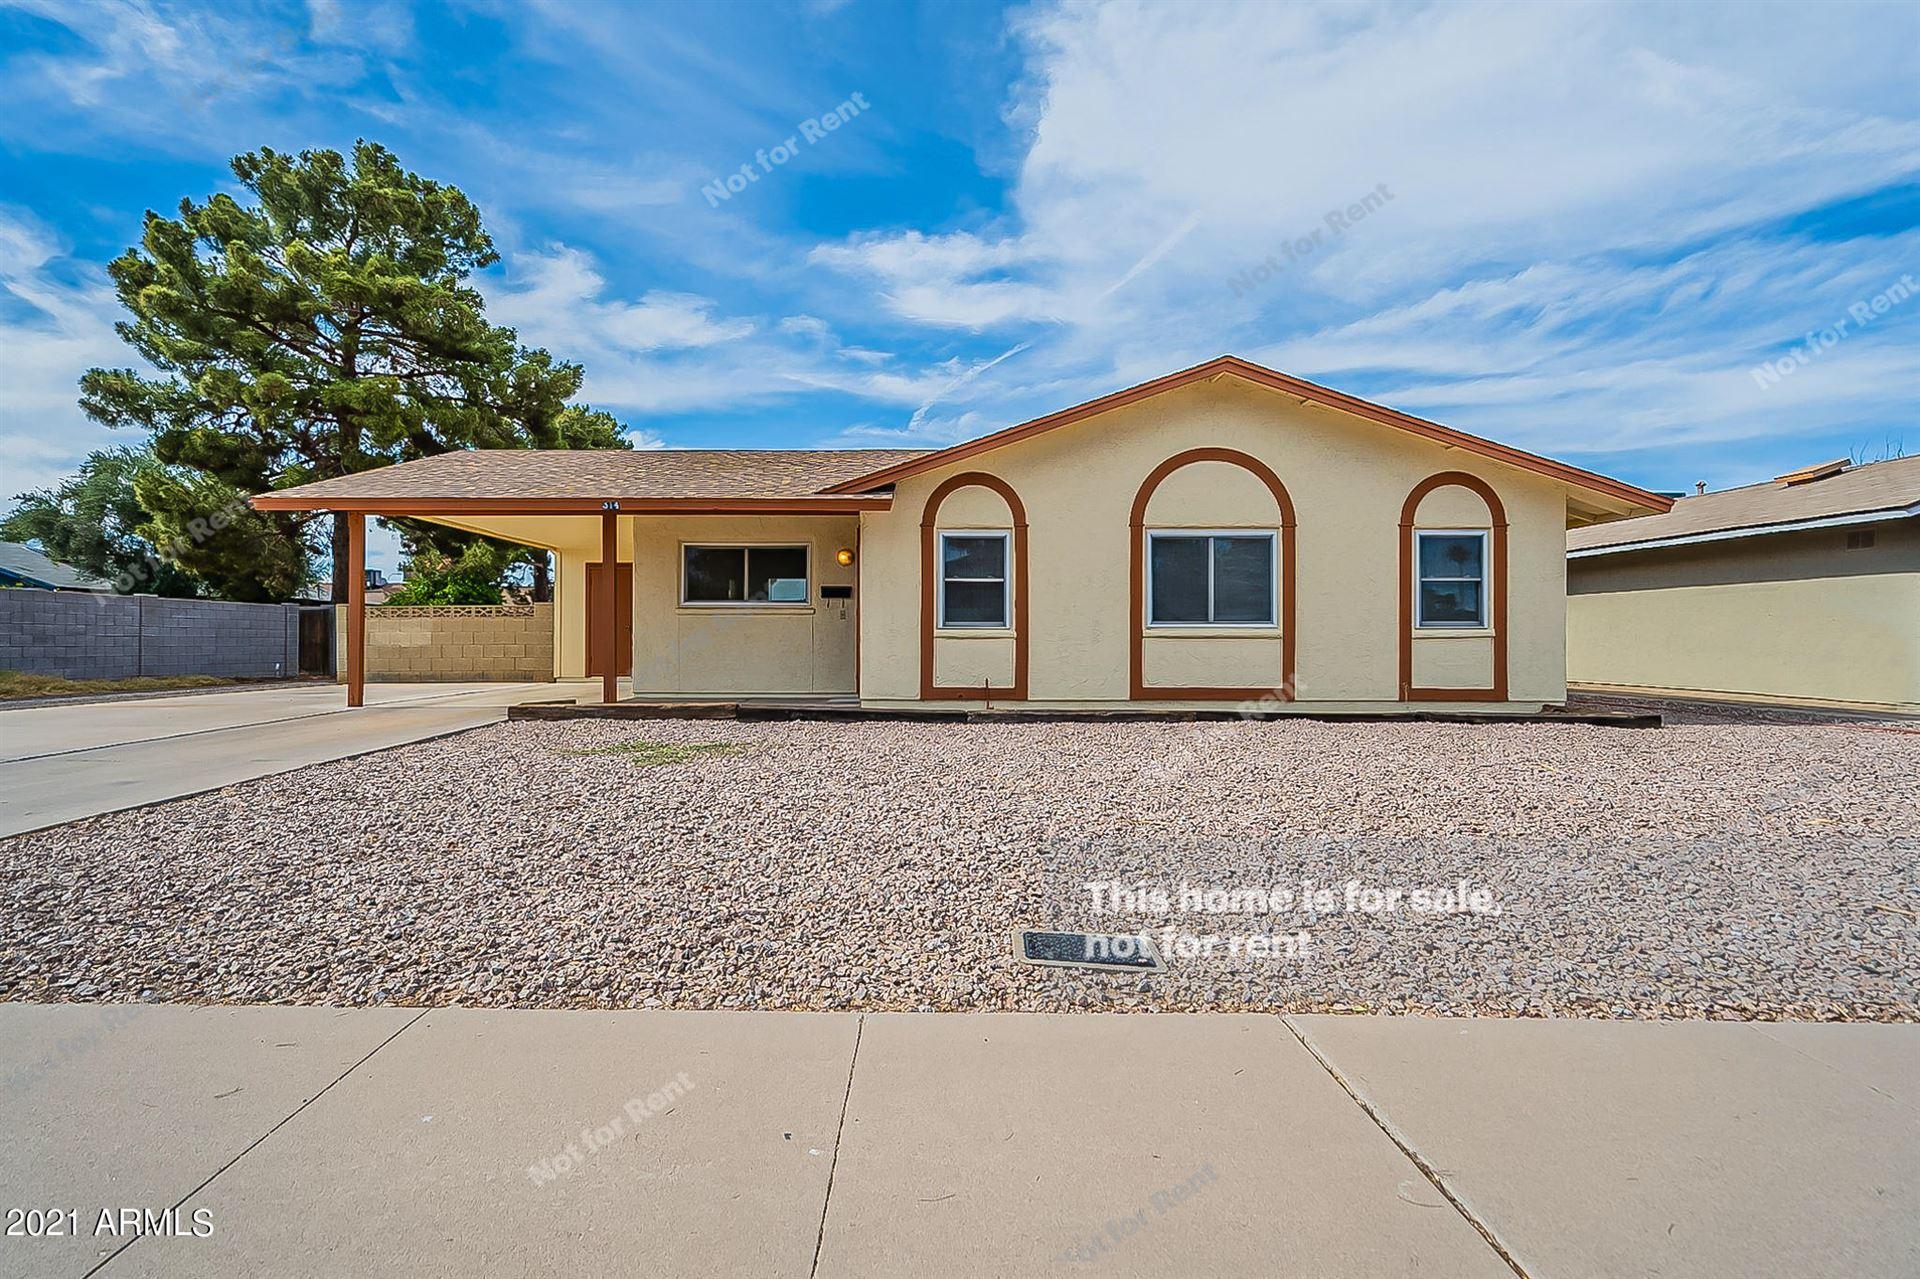 314 E ORION Street, Tempe, AZ 85283 - MLS#: 6251654